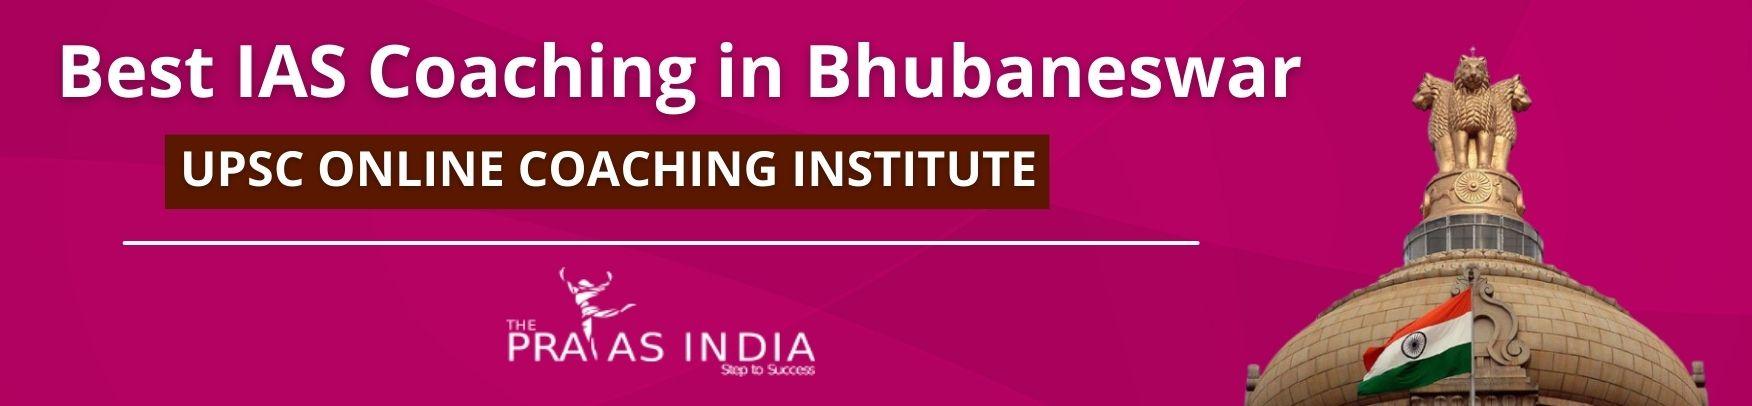 Best IAS Coaching in Bhubaneswar